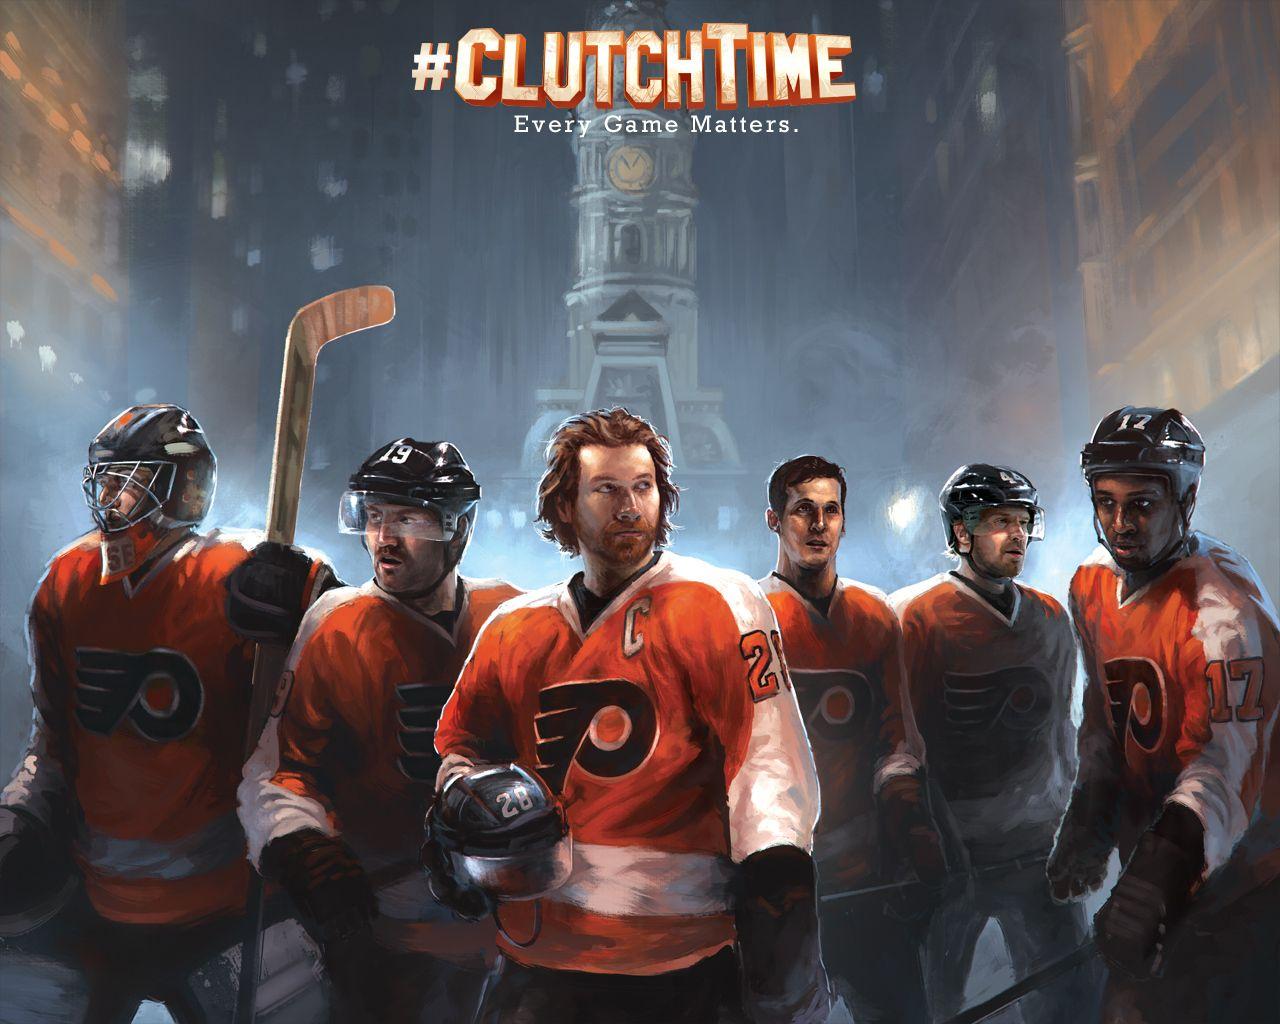 Philadelphia Flyers Flyers hockey, Philadelphia flyers